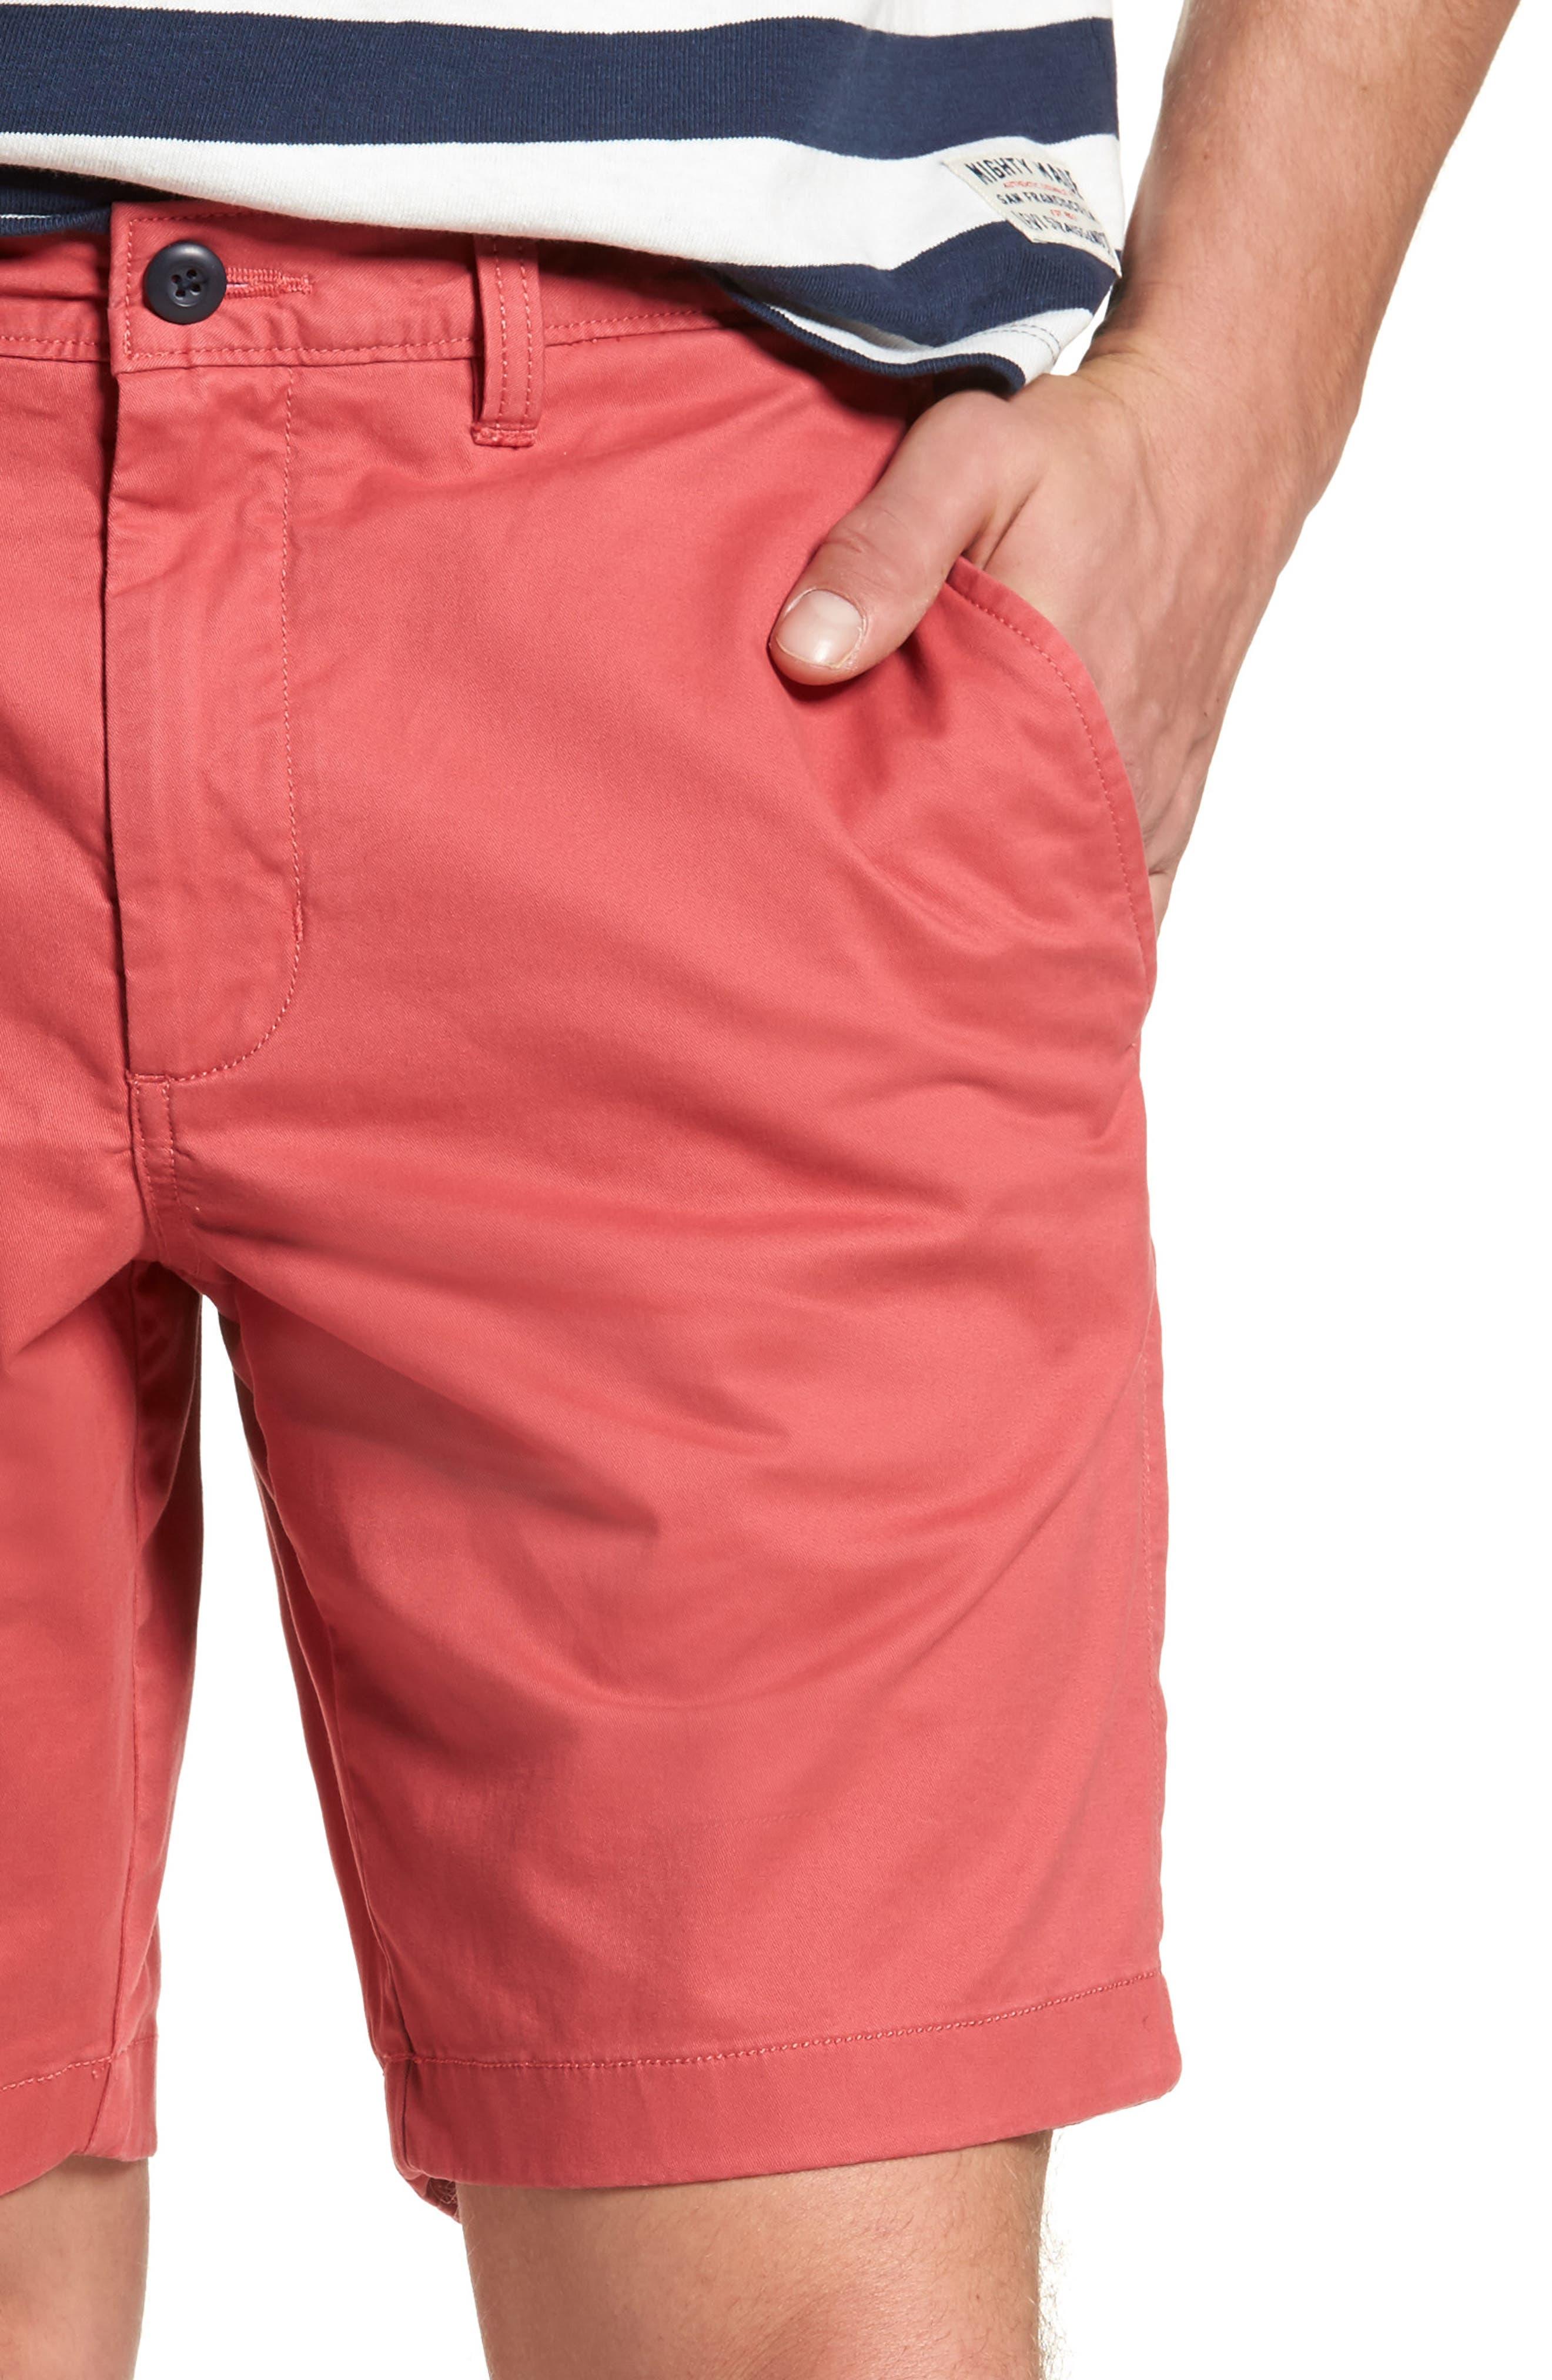 Ballard Slim Fit Stretch Chino 9-Inch Shorts,                             Alternate thumbnail 47, color,